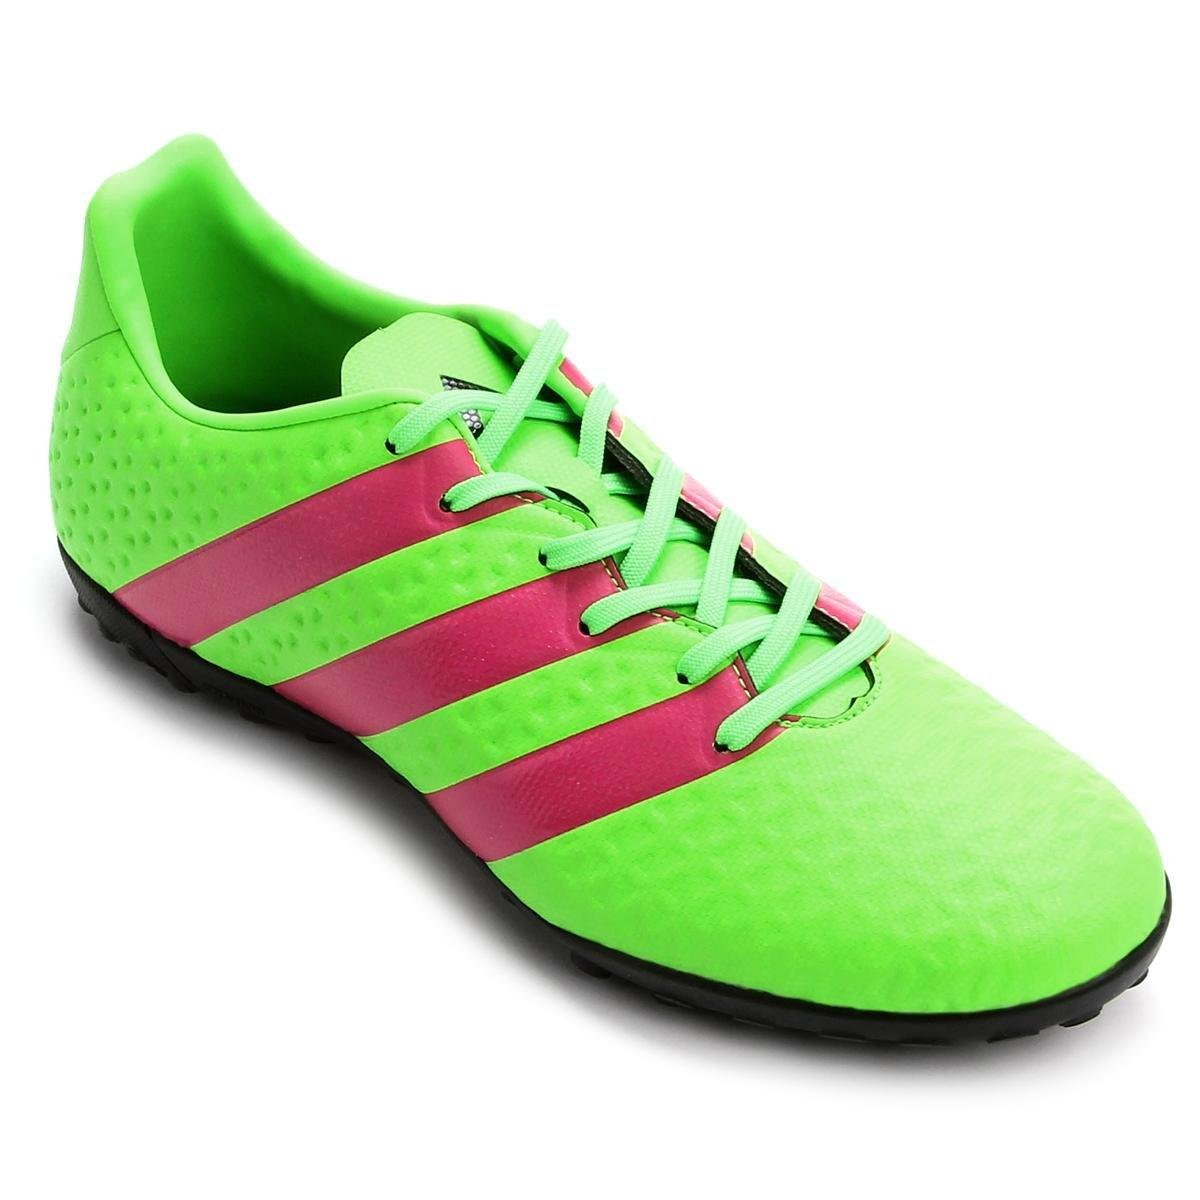 1b866823bc Chuteira Society Adidas Ace 16.4 TF Masculina - Verde Limão e Pink ...